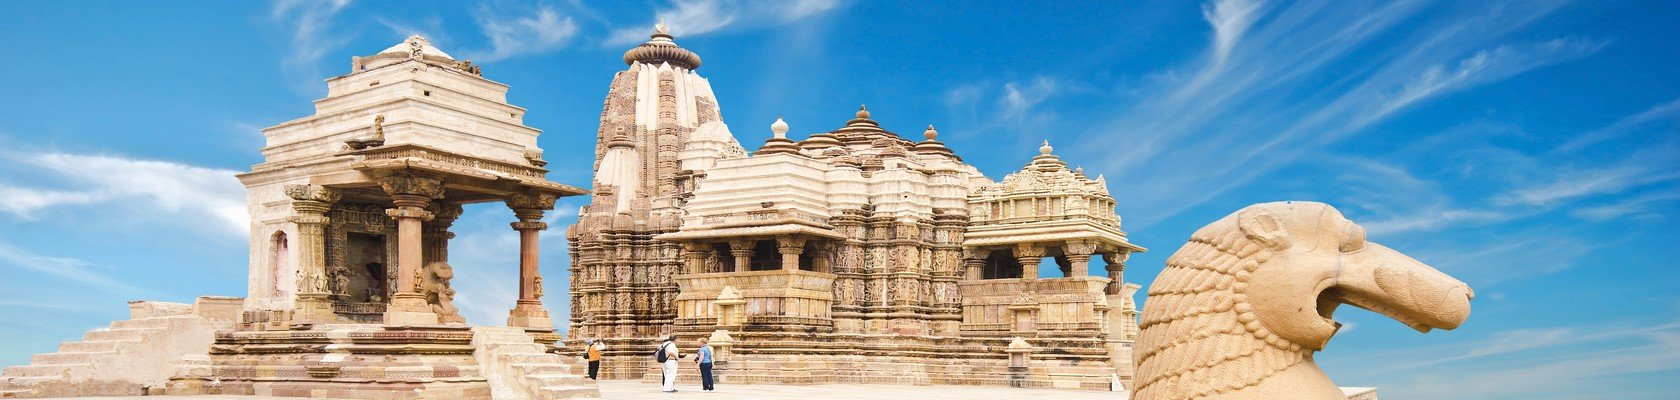 Erotische tempels van Khajuraho